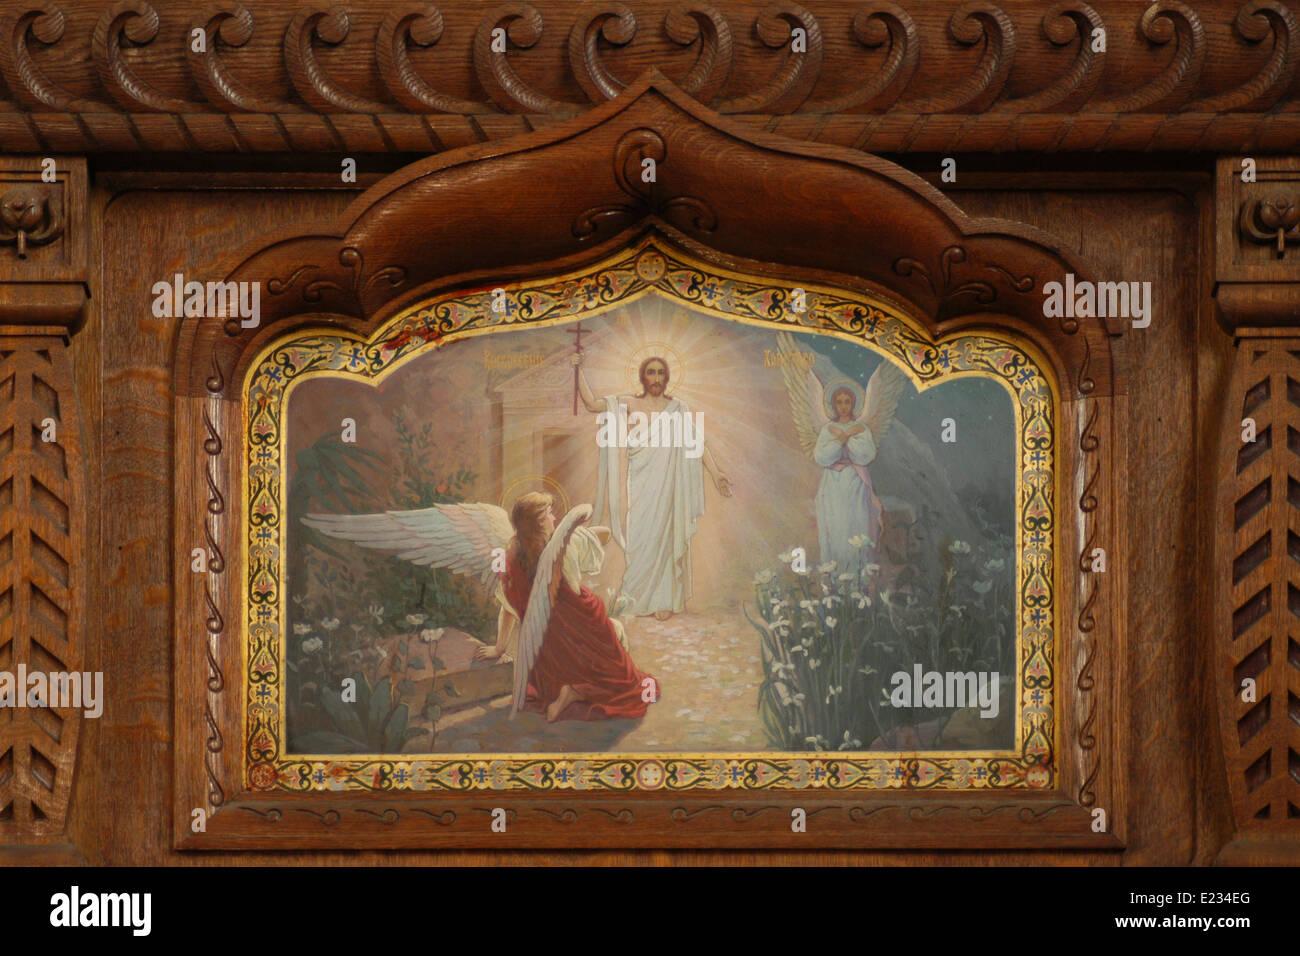 Resurrection of Jesus. An Icon from the iconostasis of the Orthodox Church of Saint Olga in Frantiskovy Lazne, Czech - Stock Image